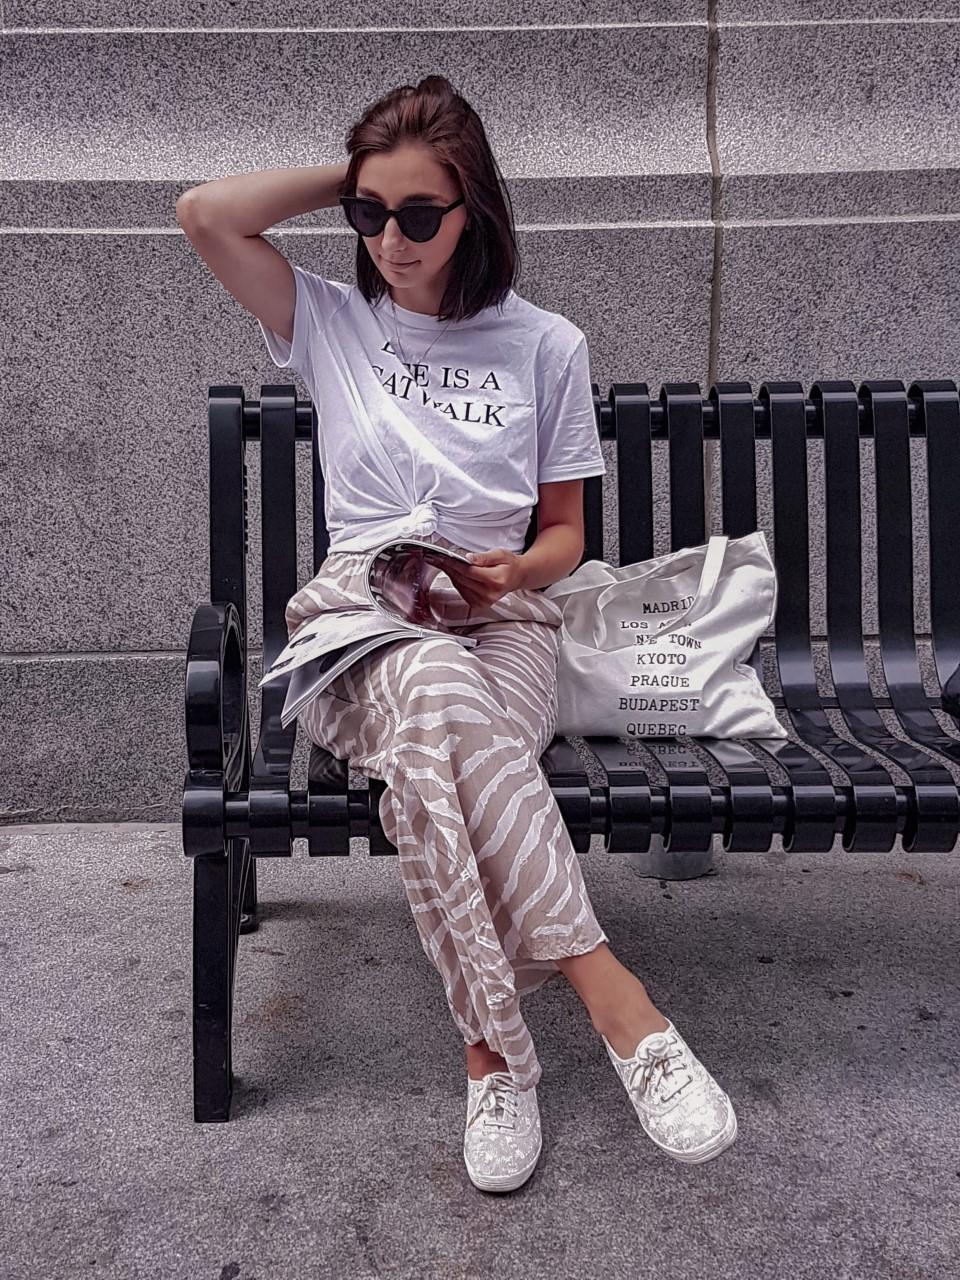 fashion, street style, city style, Montreal, H&M, Zara, Forever 21, Highstreet, OOTD, Fashion magazine, Porter Magazine, Vogue, Lifestyle